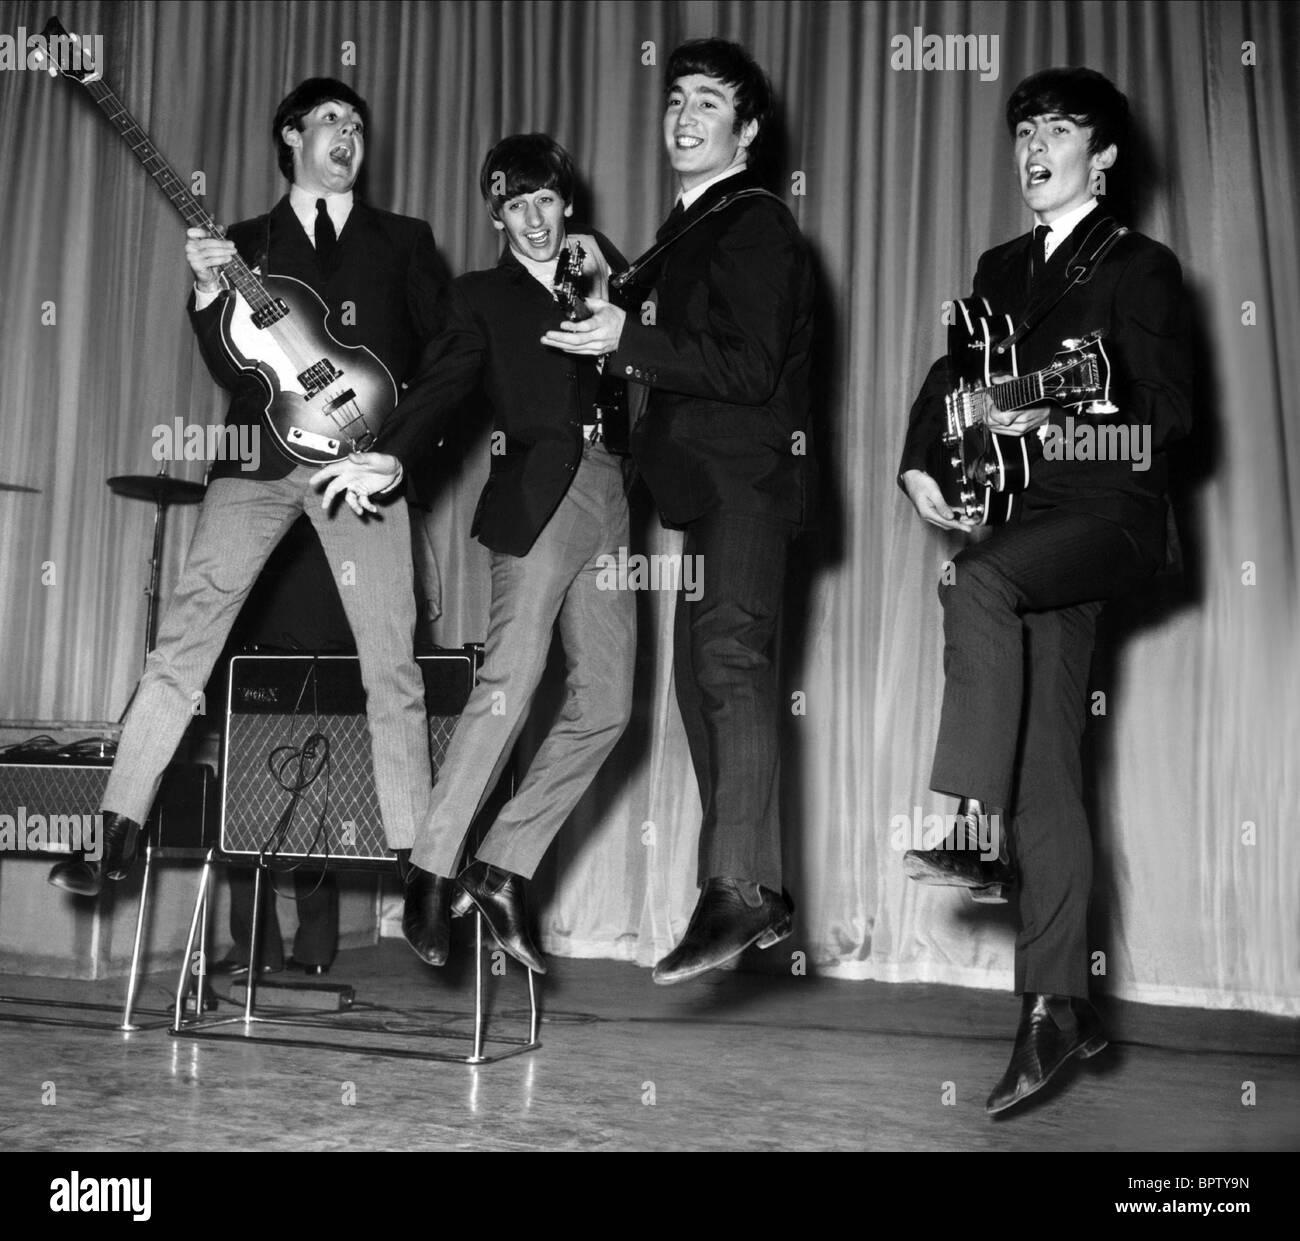 PAUL MCCARTNEY RINGO STARR JOHN LENNON & GEORGE HARRISON THE BEATLES (1963) - Stock Image